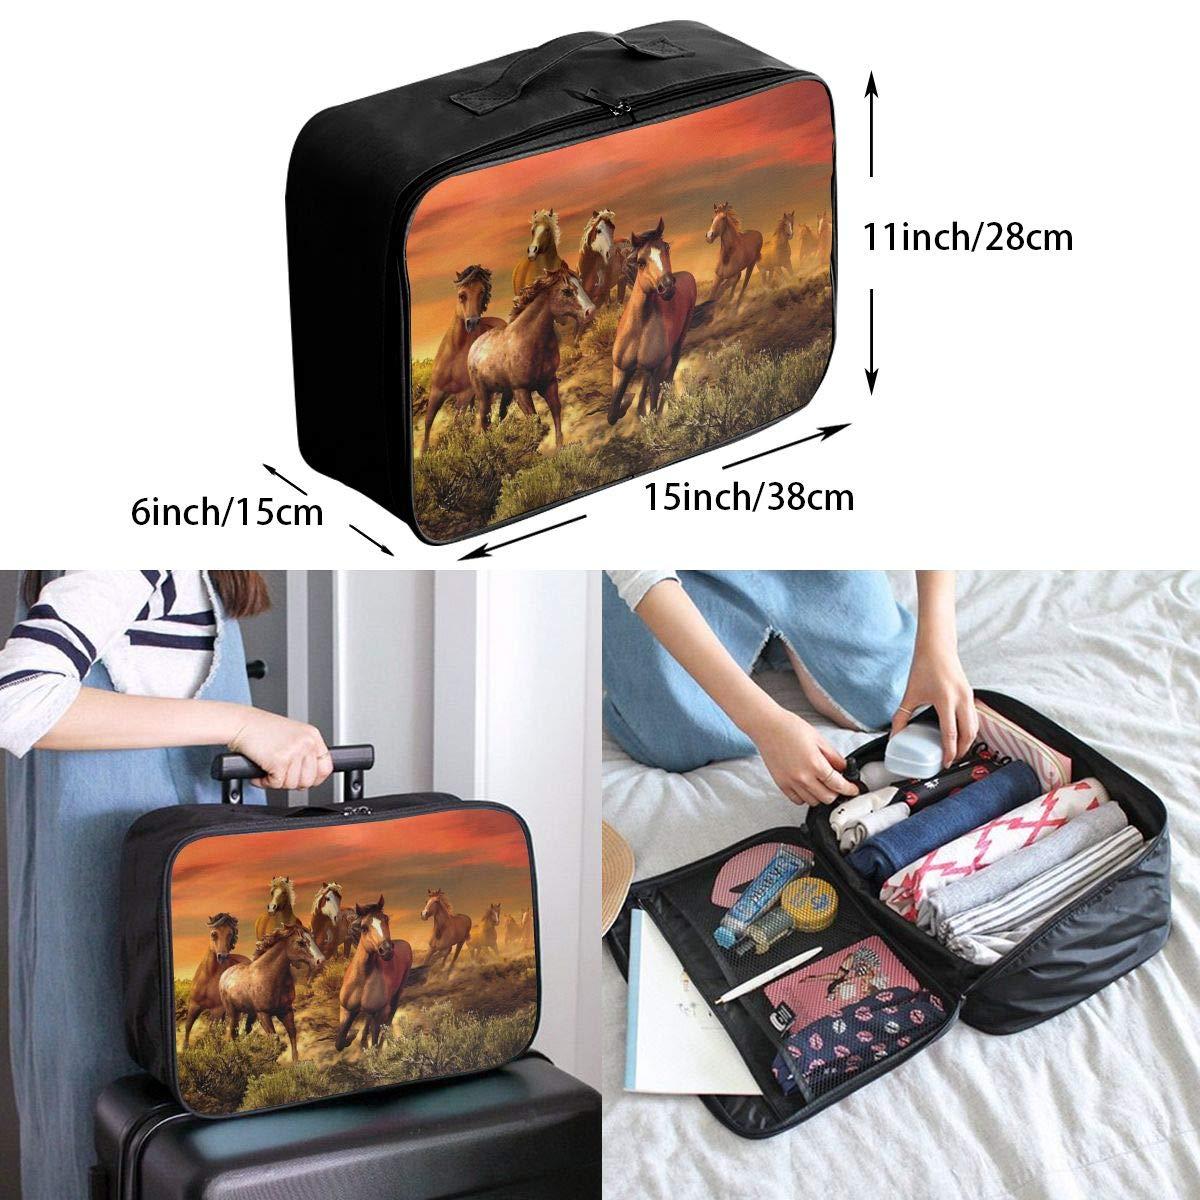 Travel Luggage Duffle Bag Lightweight Portable Handbag Running Horse Painting Large Capacity Waterproof Foldable Storage Tote